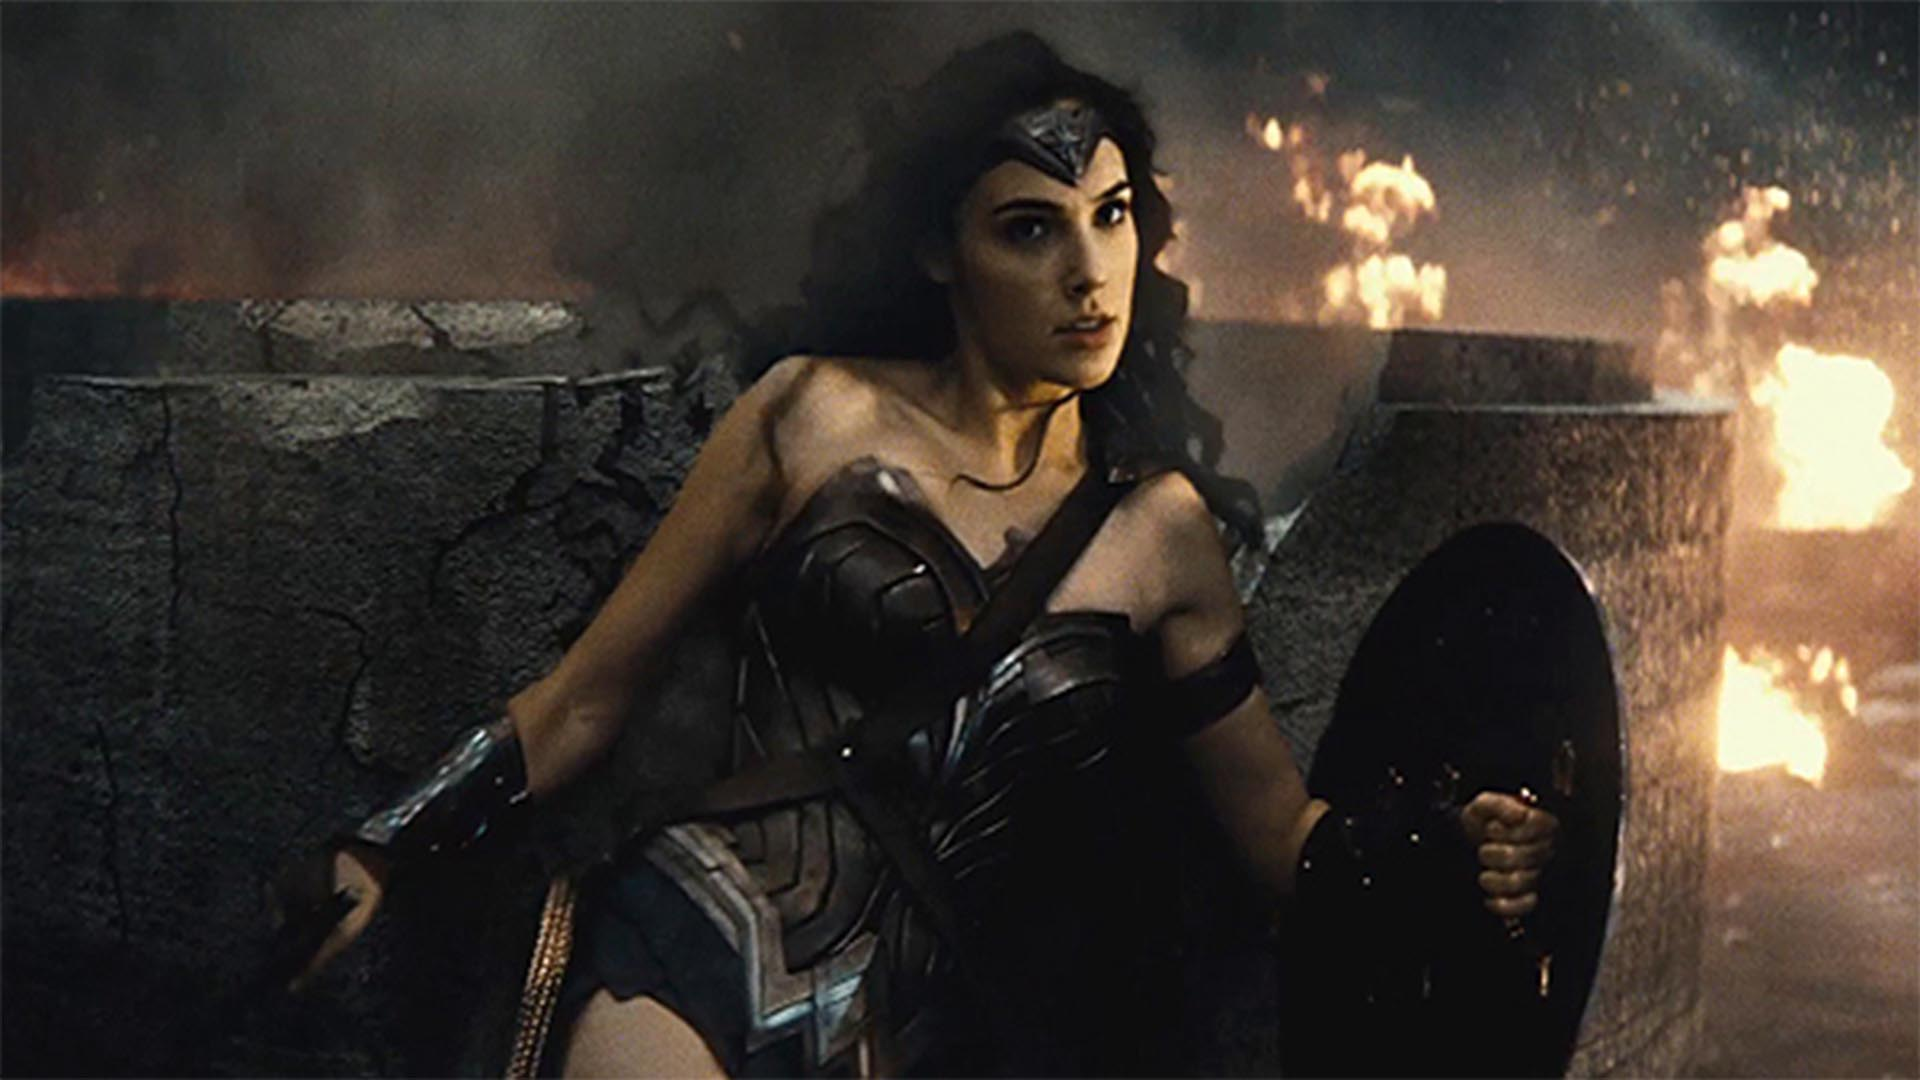 Wonder Woman film 2017 HD wallpapers free download